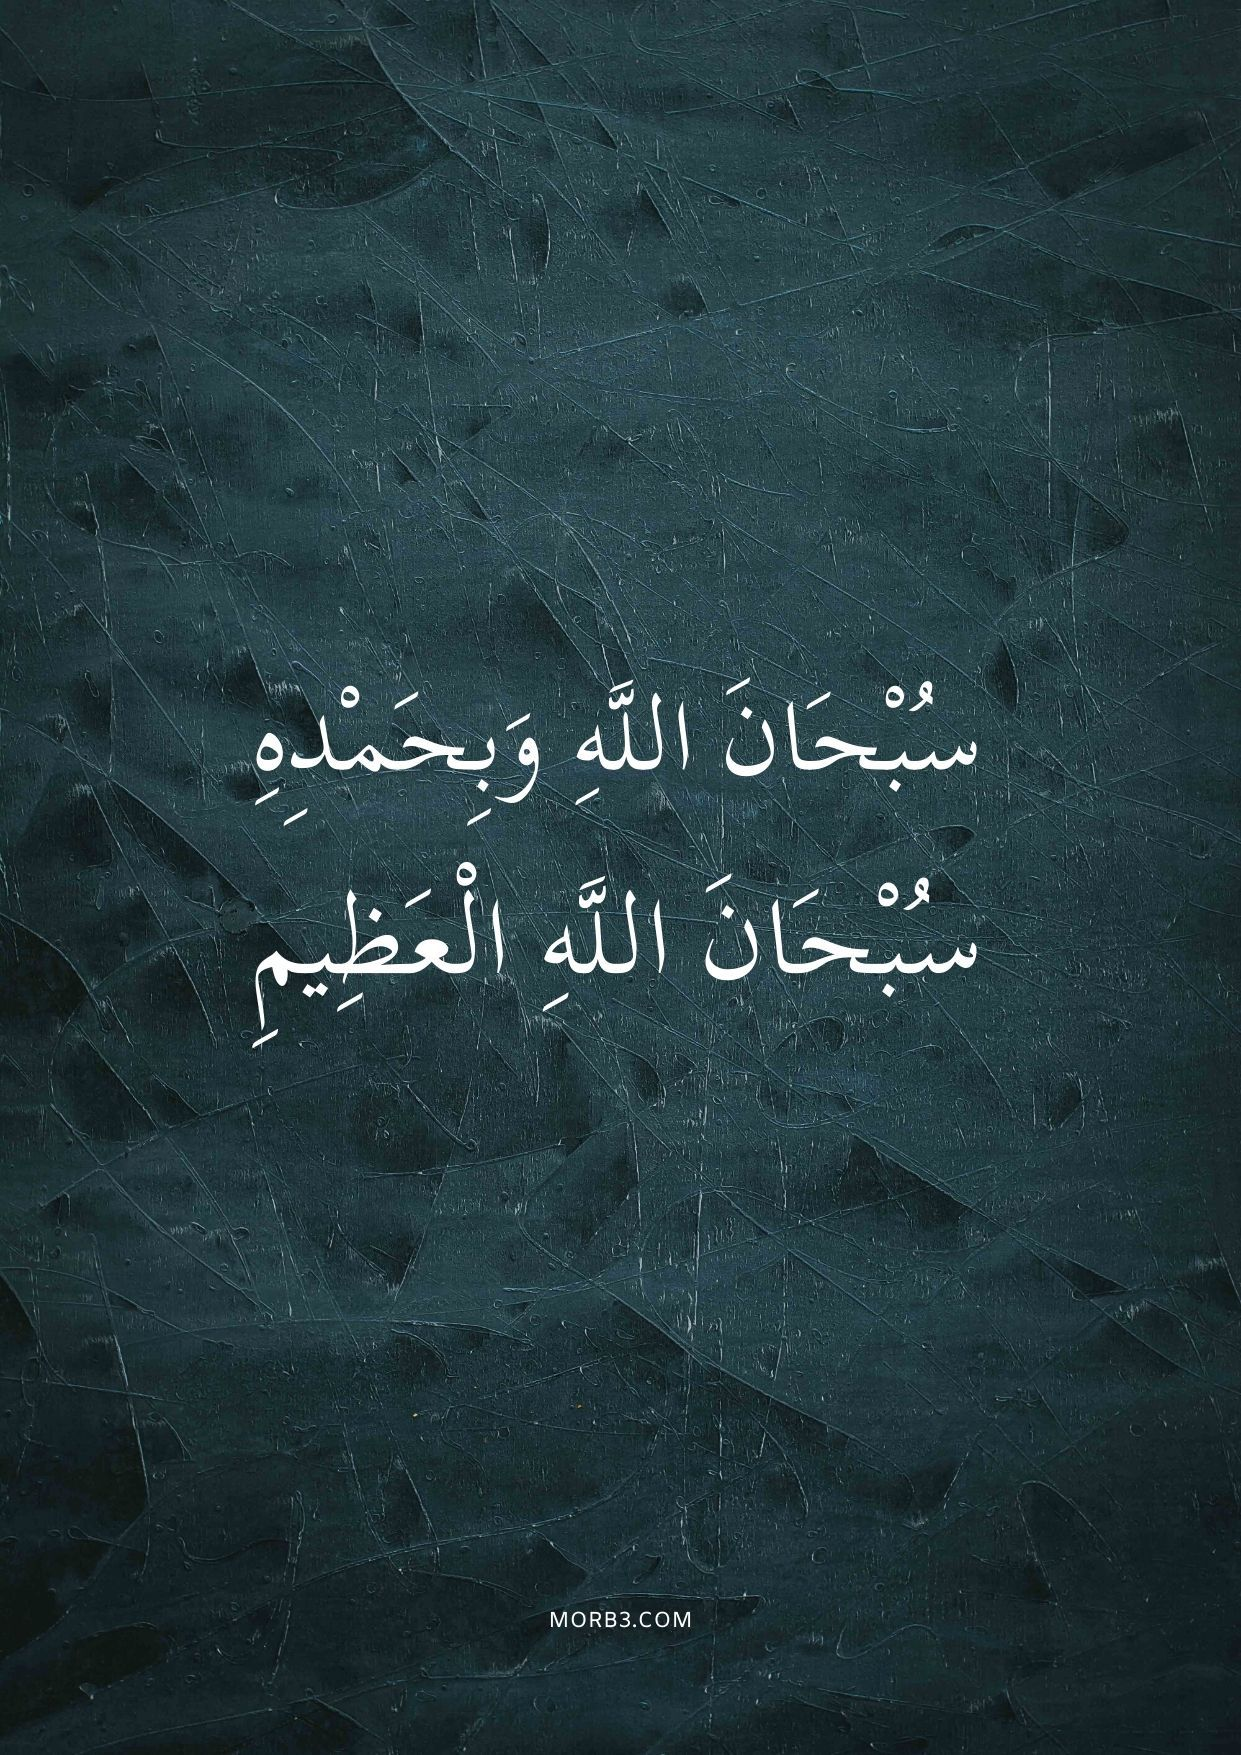 صباح الفرج Good Morning Arabic Beautiful Quran Quotes Quran Verses